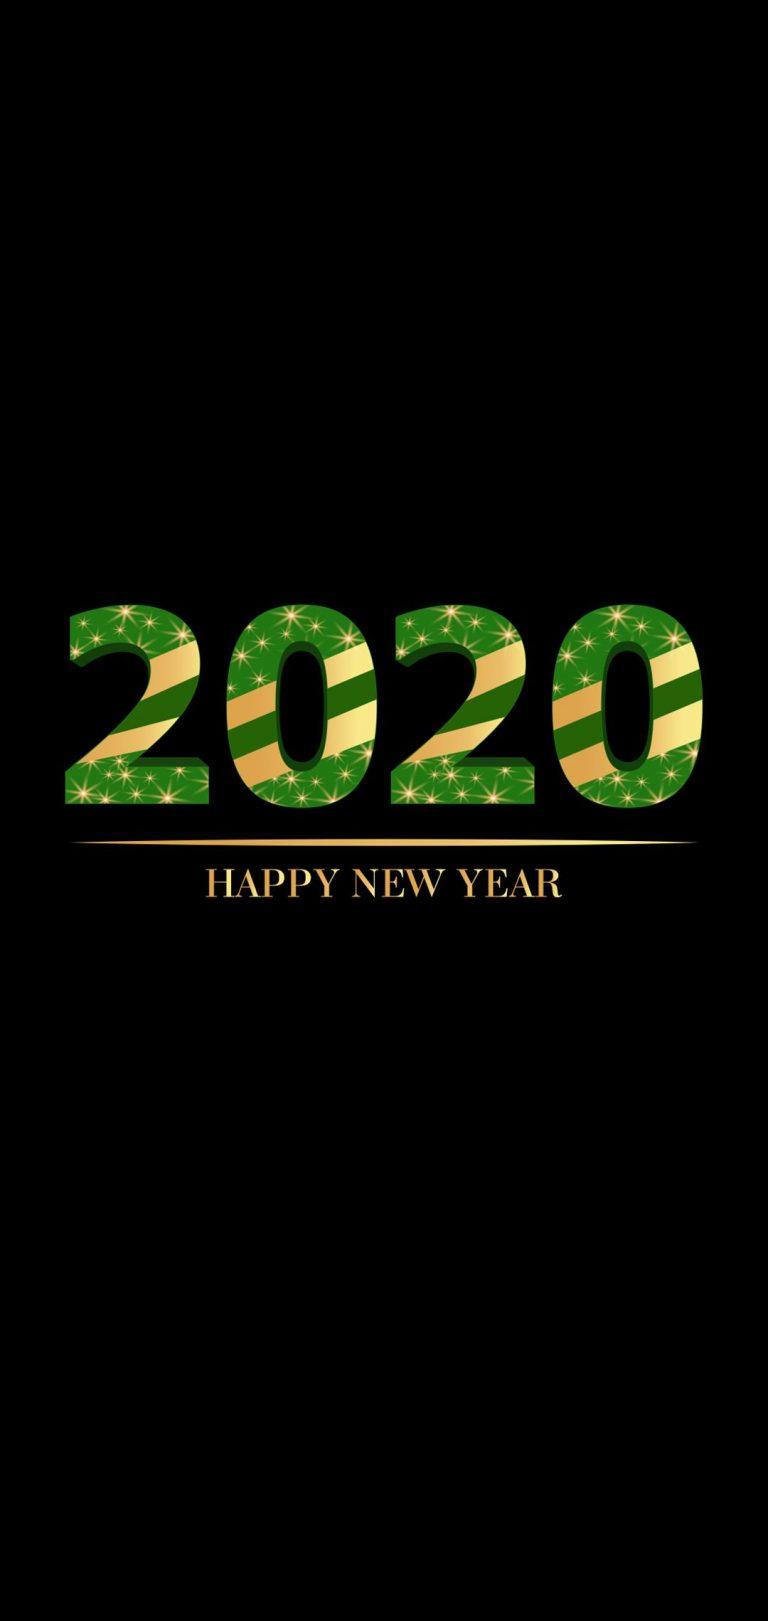 Happy New Year 2020 Phone Wallpaper 04 - [1080x2280]